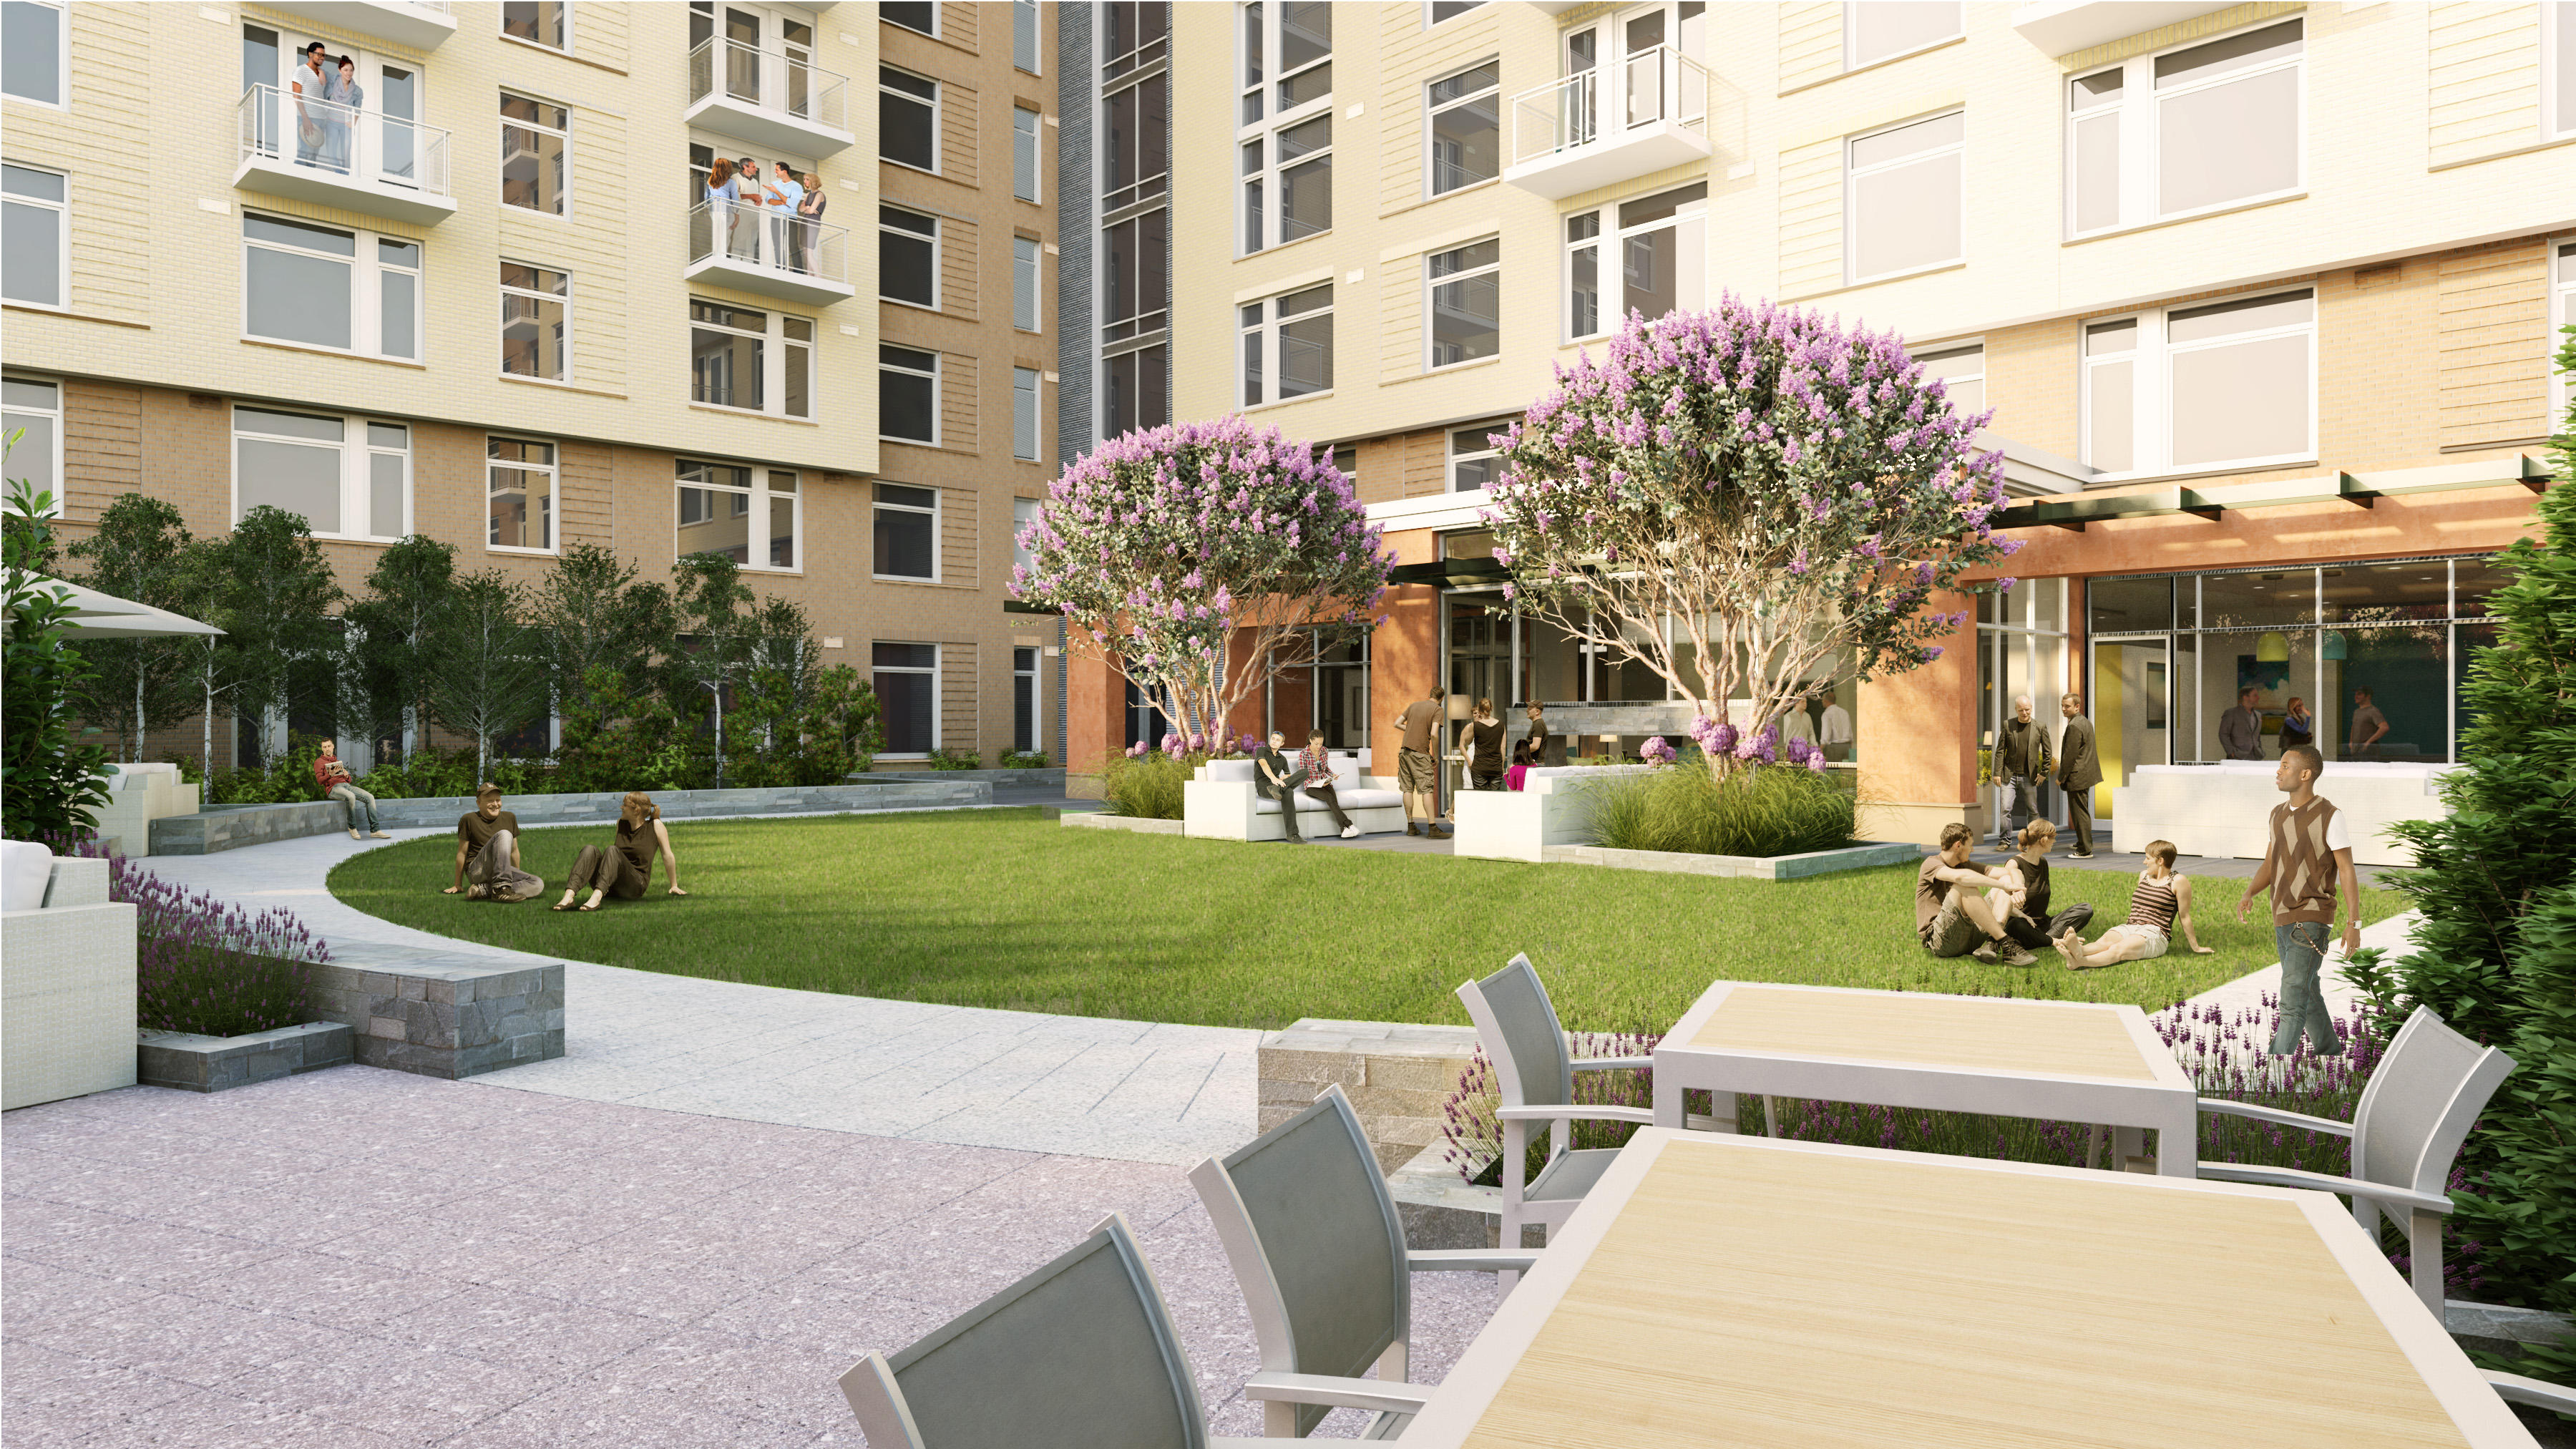 Solaire 8250 Apartments image 1